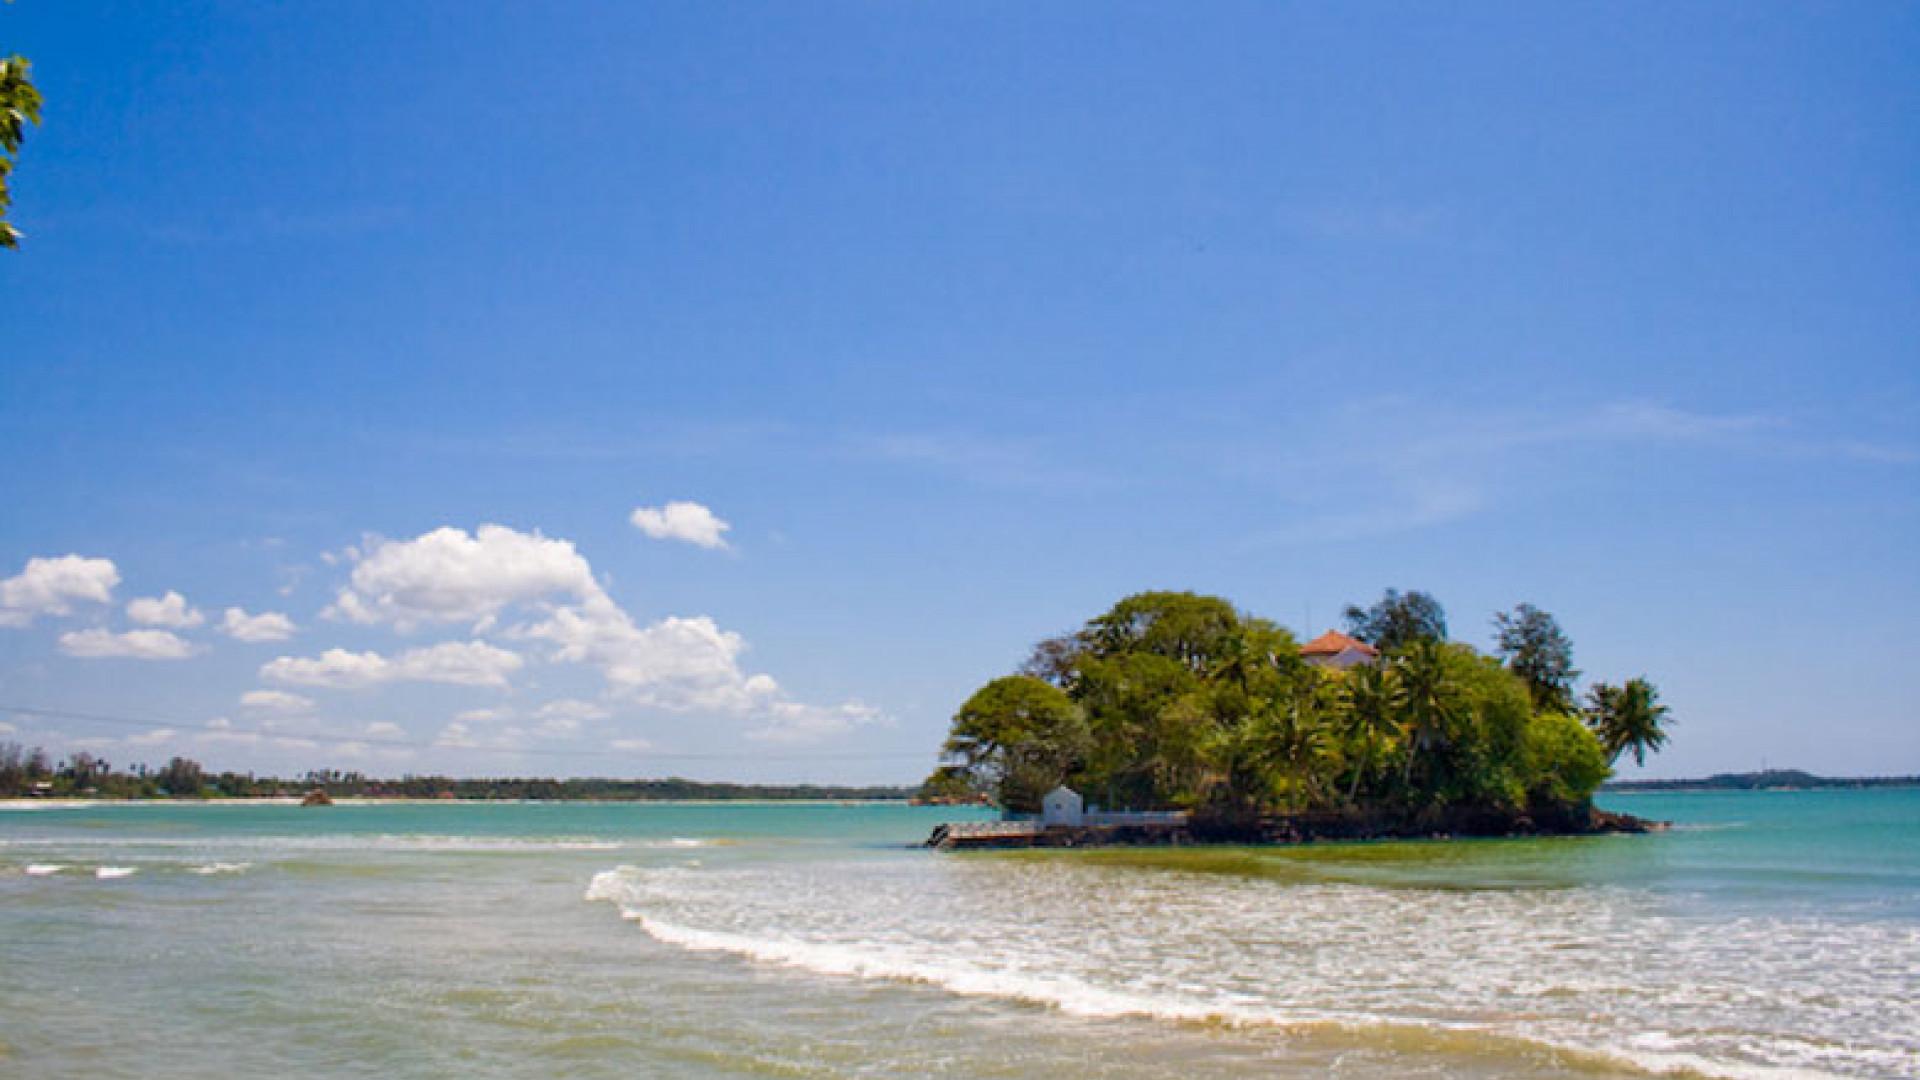 Courtesy-of-Ghetan-Kumara---Taprobane-Island-(2)